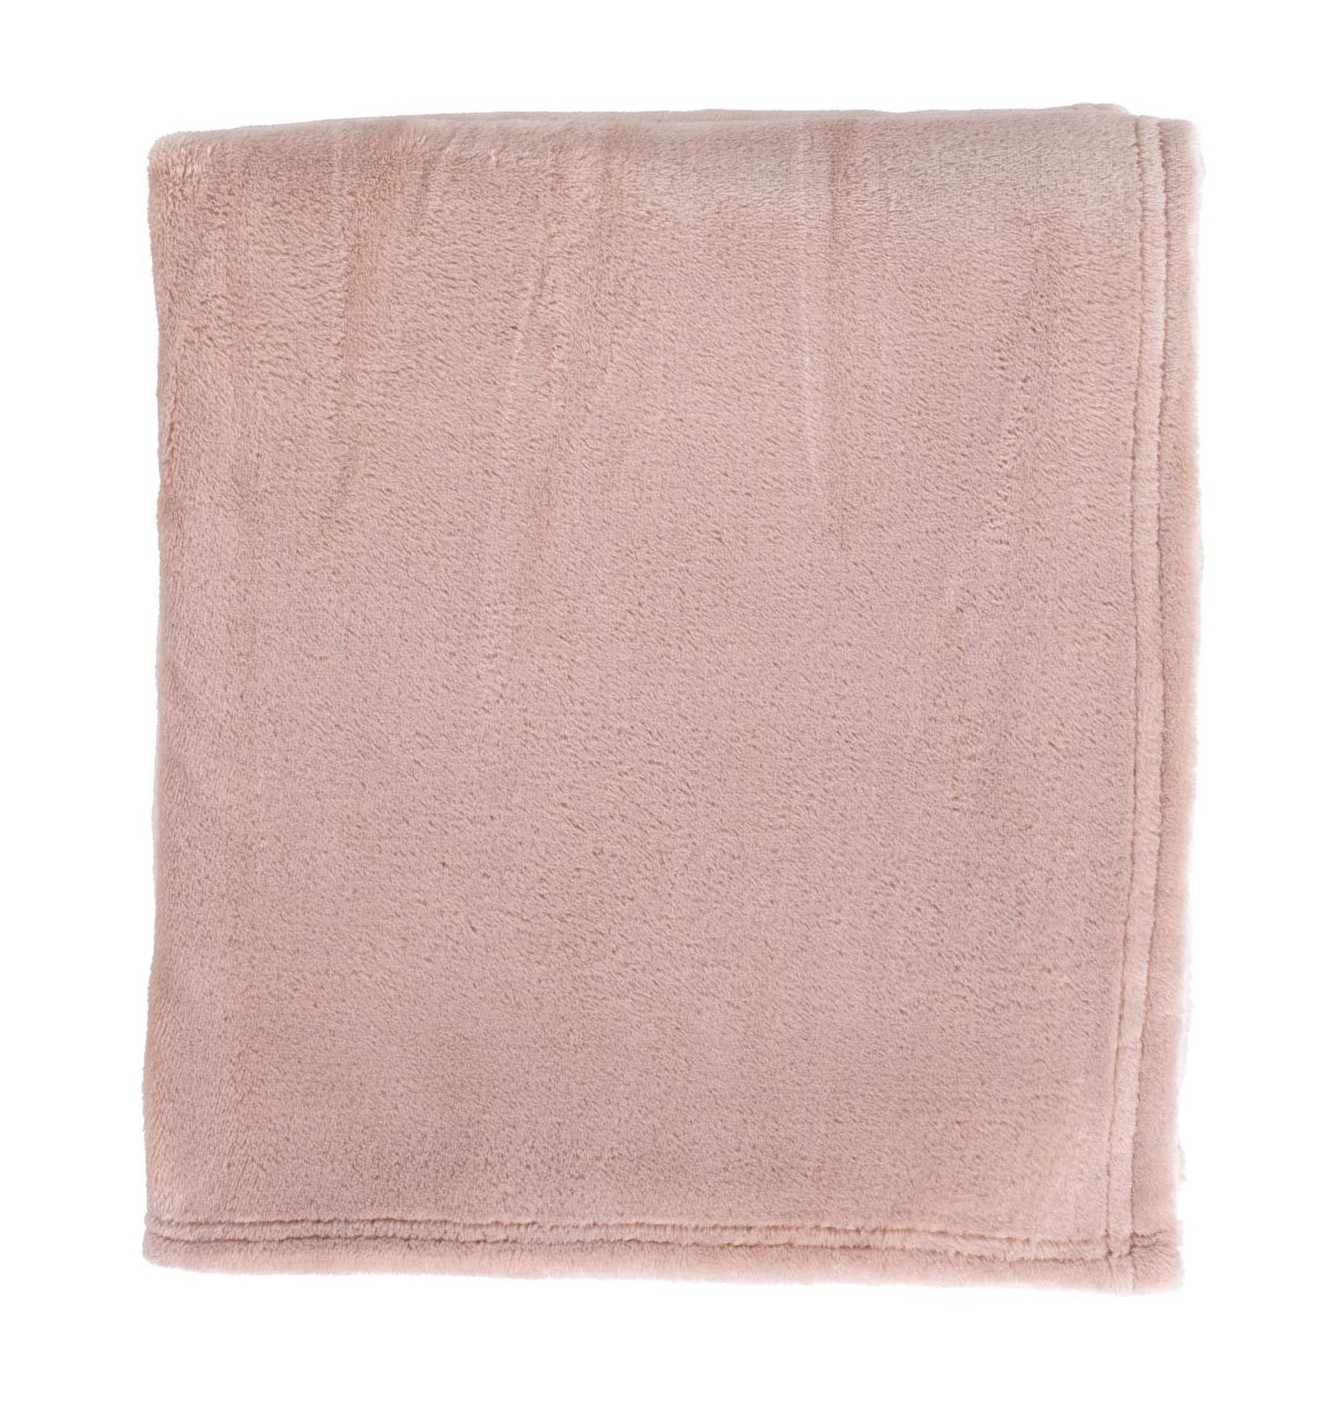 FLANEL - Plaid nude 150x200 cm